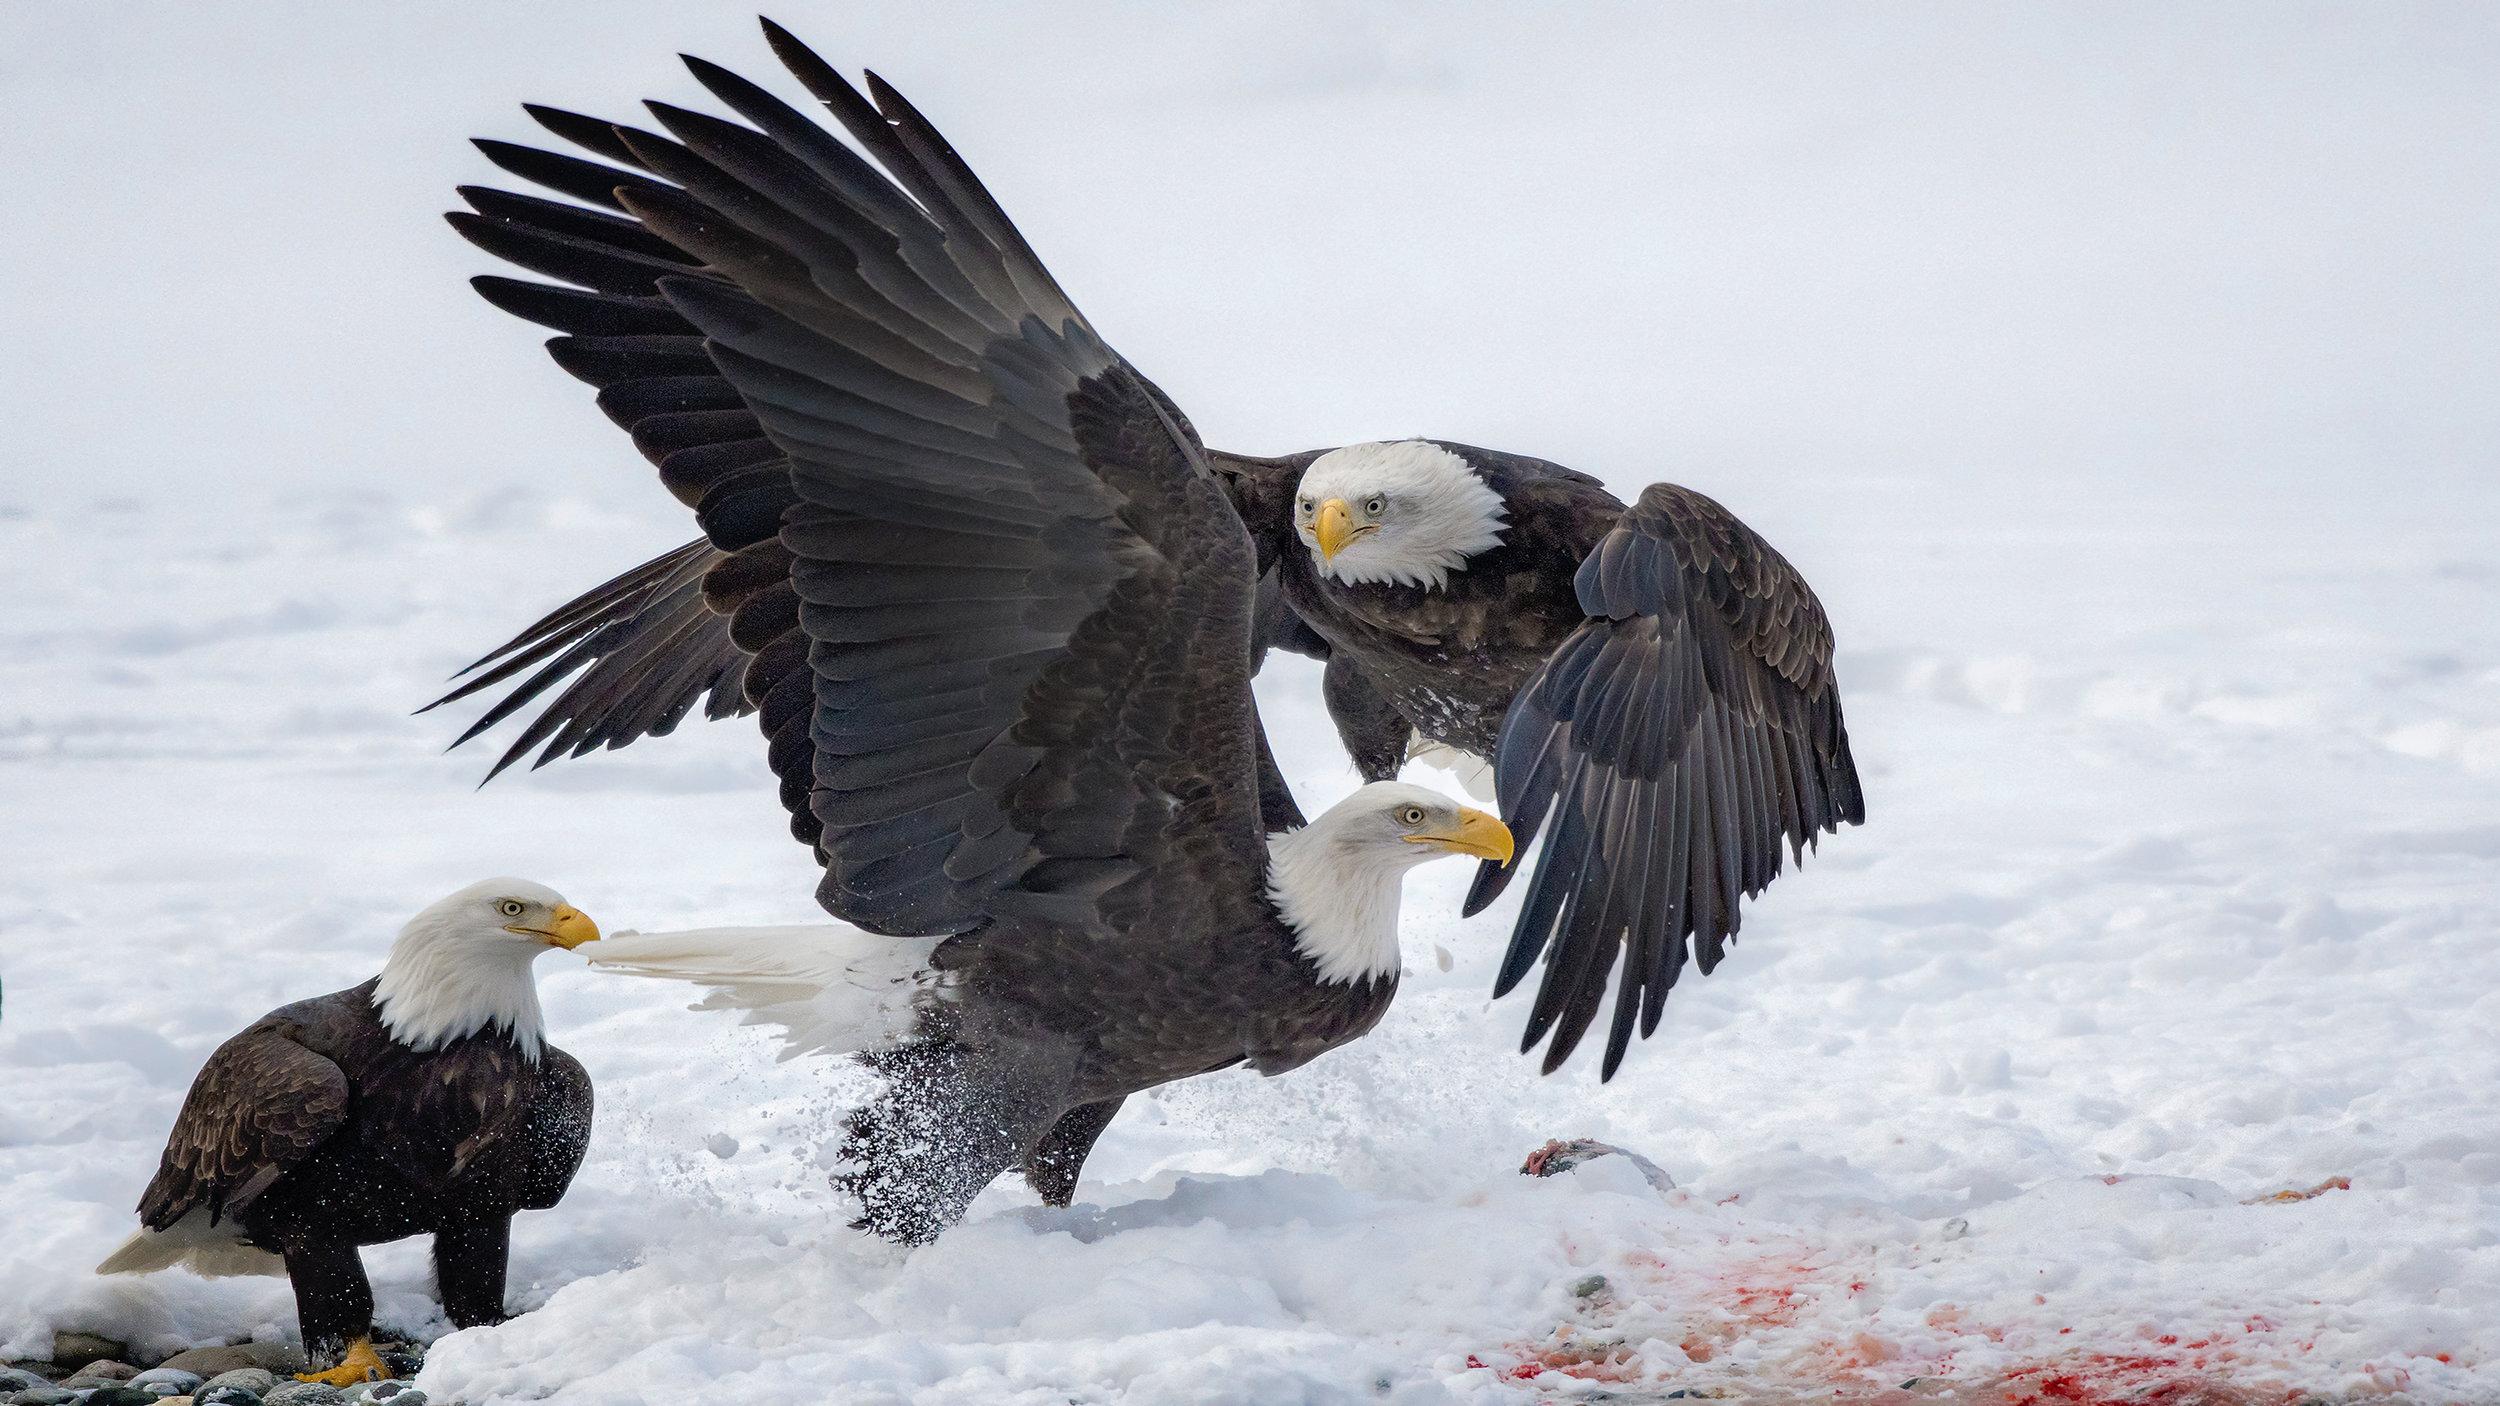 Q. EaglePortfolio_Image_20_©BrianRiveraUncapher.jpg